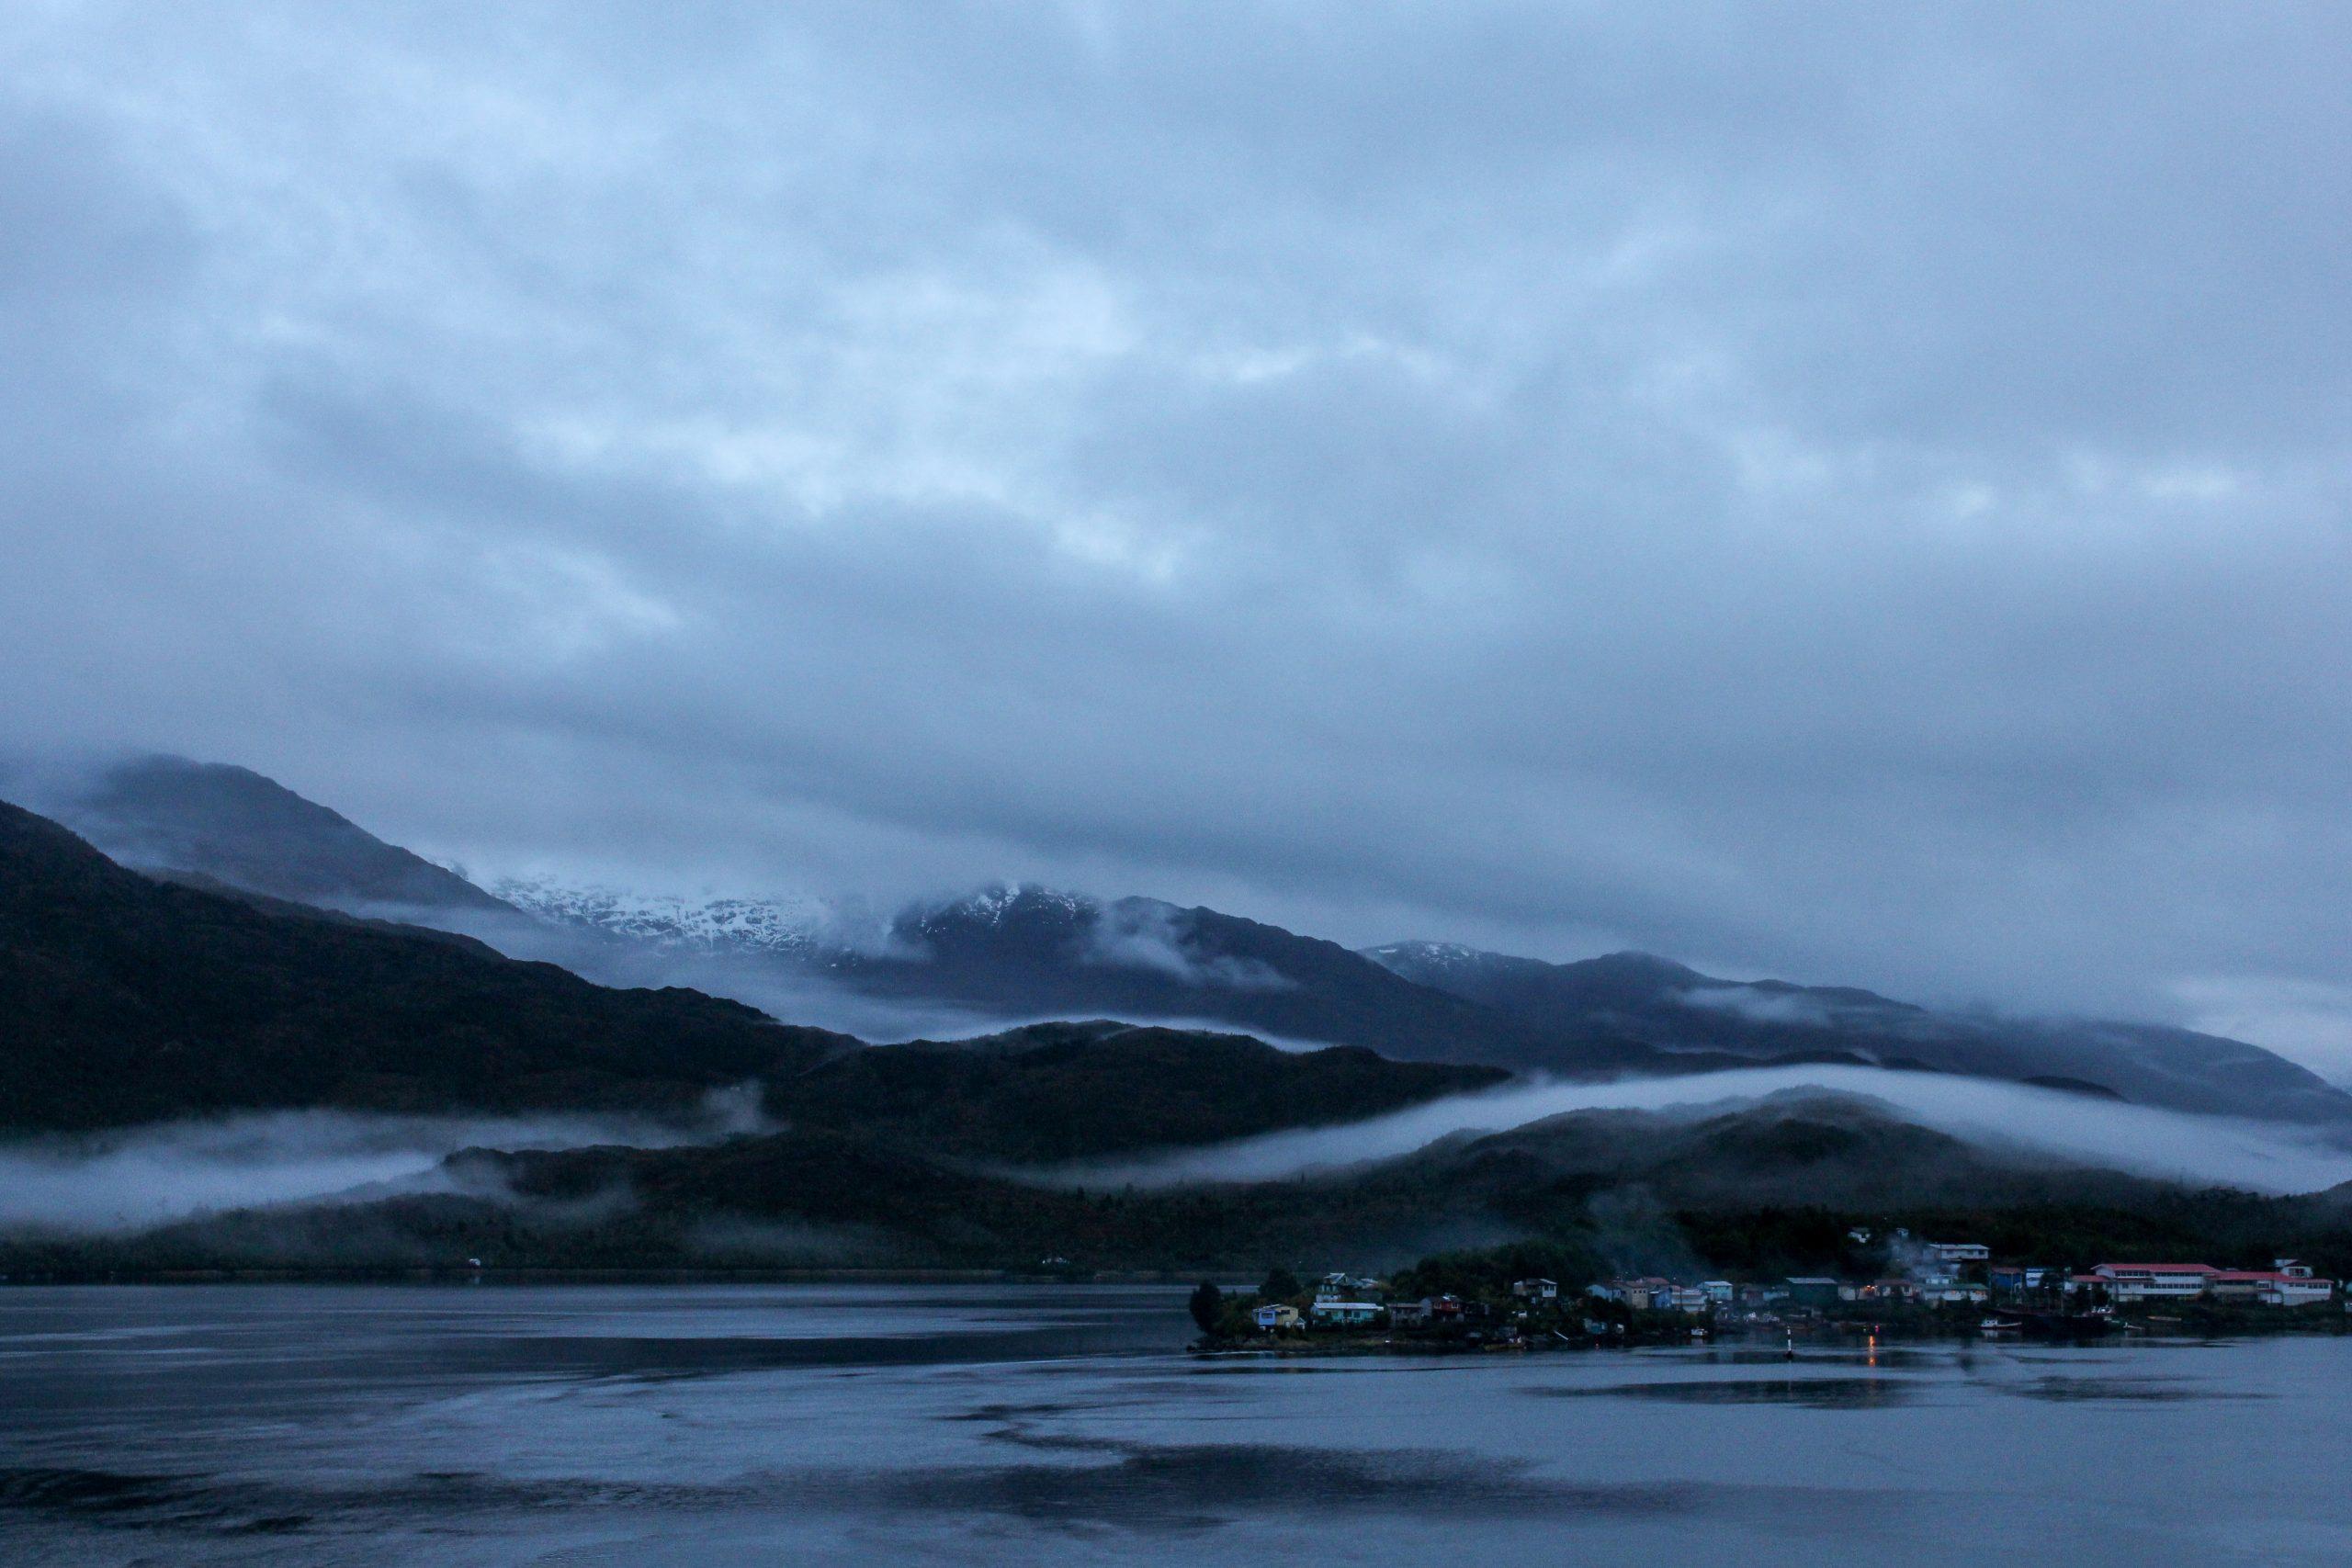 Puerto Eden Hamlet, Patagonia, Chile, South America